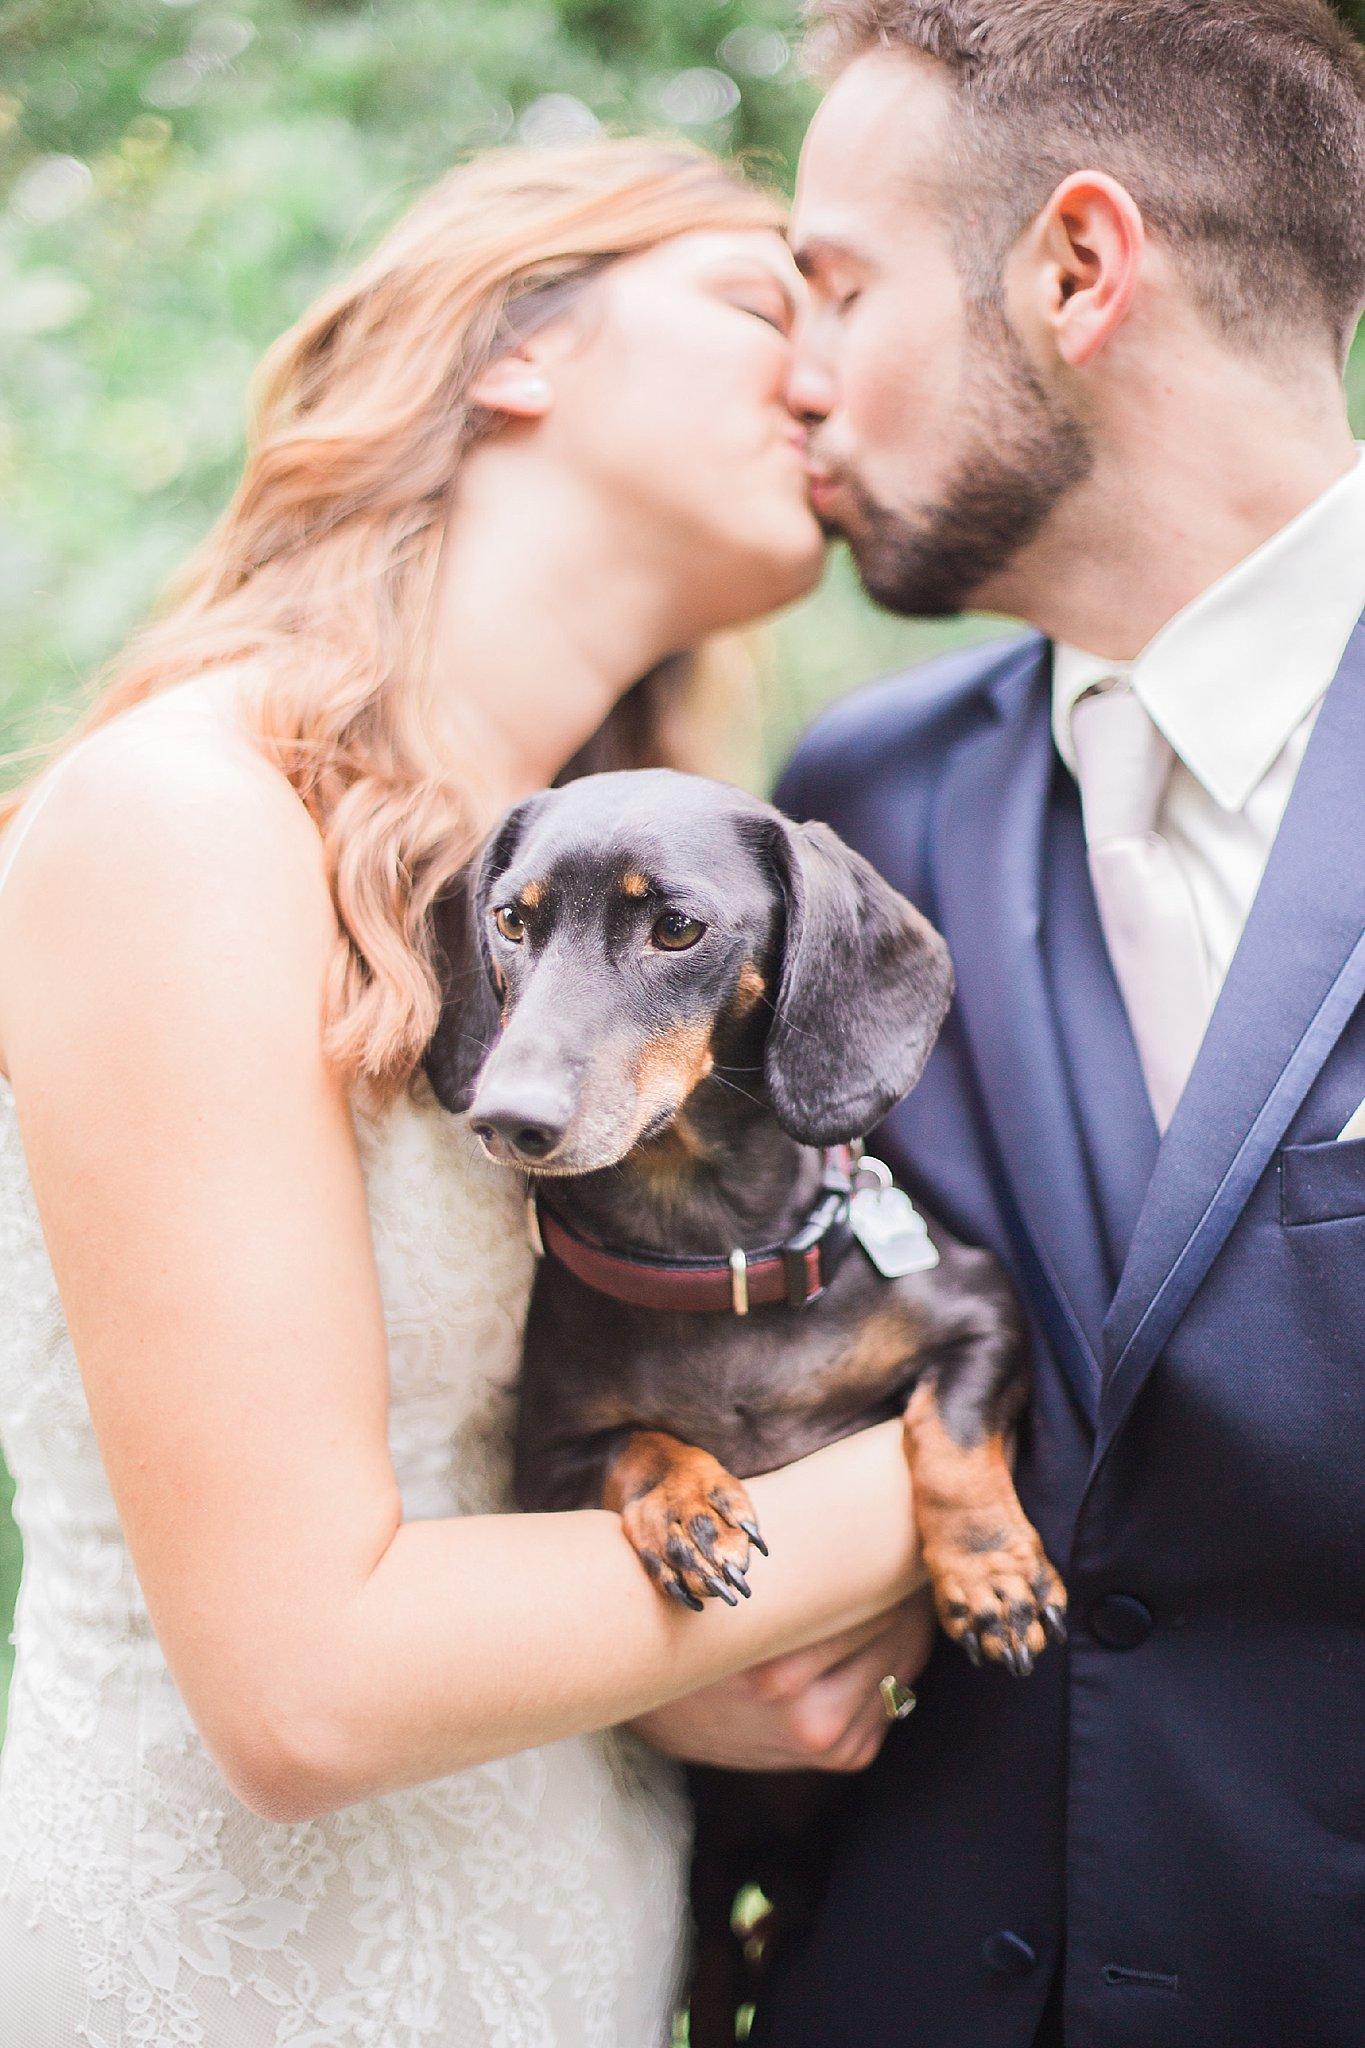 Classic Pineridge Hollow Wedding | Winnipeg Wedding Photographer | Couples Photos with Dog |Keila Marie Photography